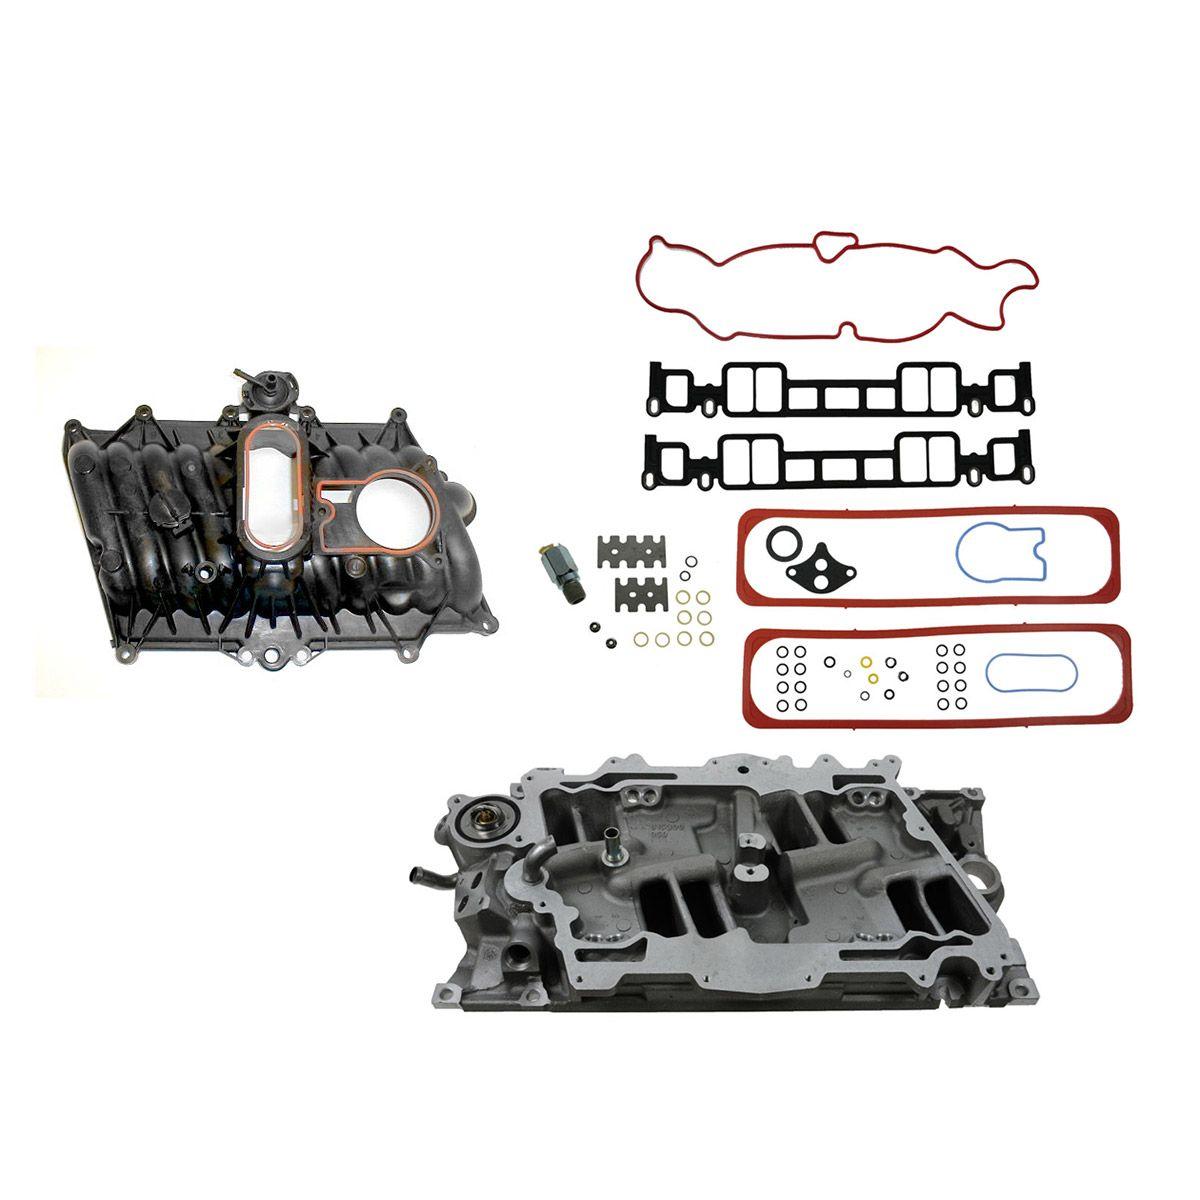 Upper Lower Intake Manifold Set Kit For 96 02 Chevy Gmc Truck Van Suv 5 0l 5 7l